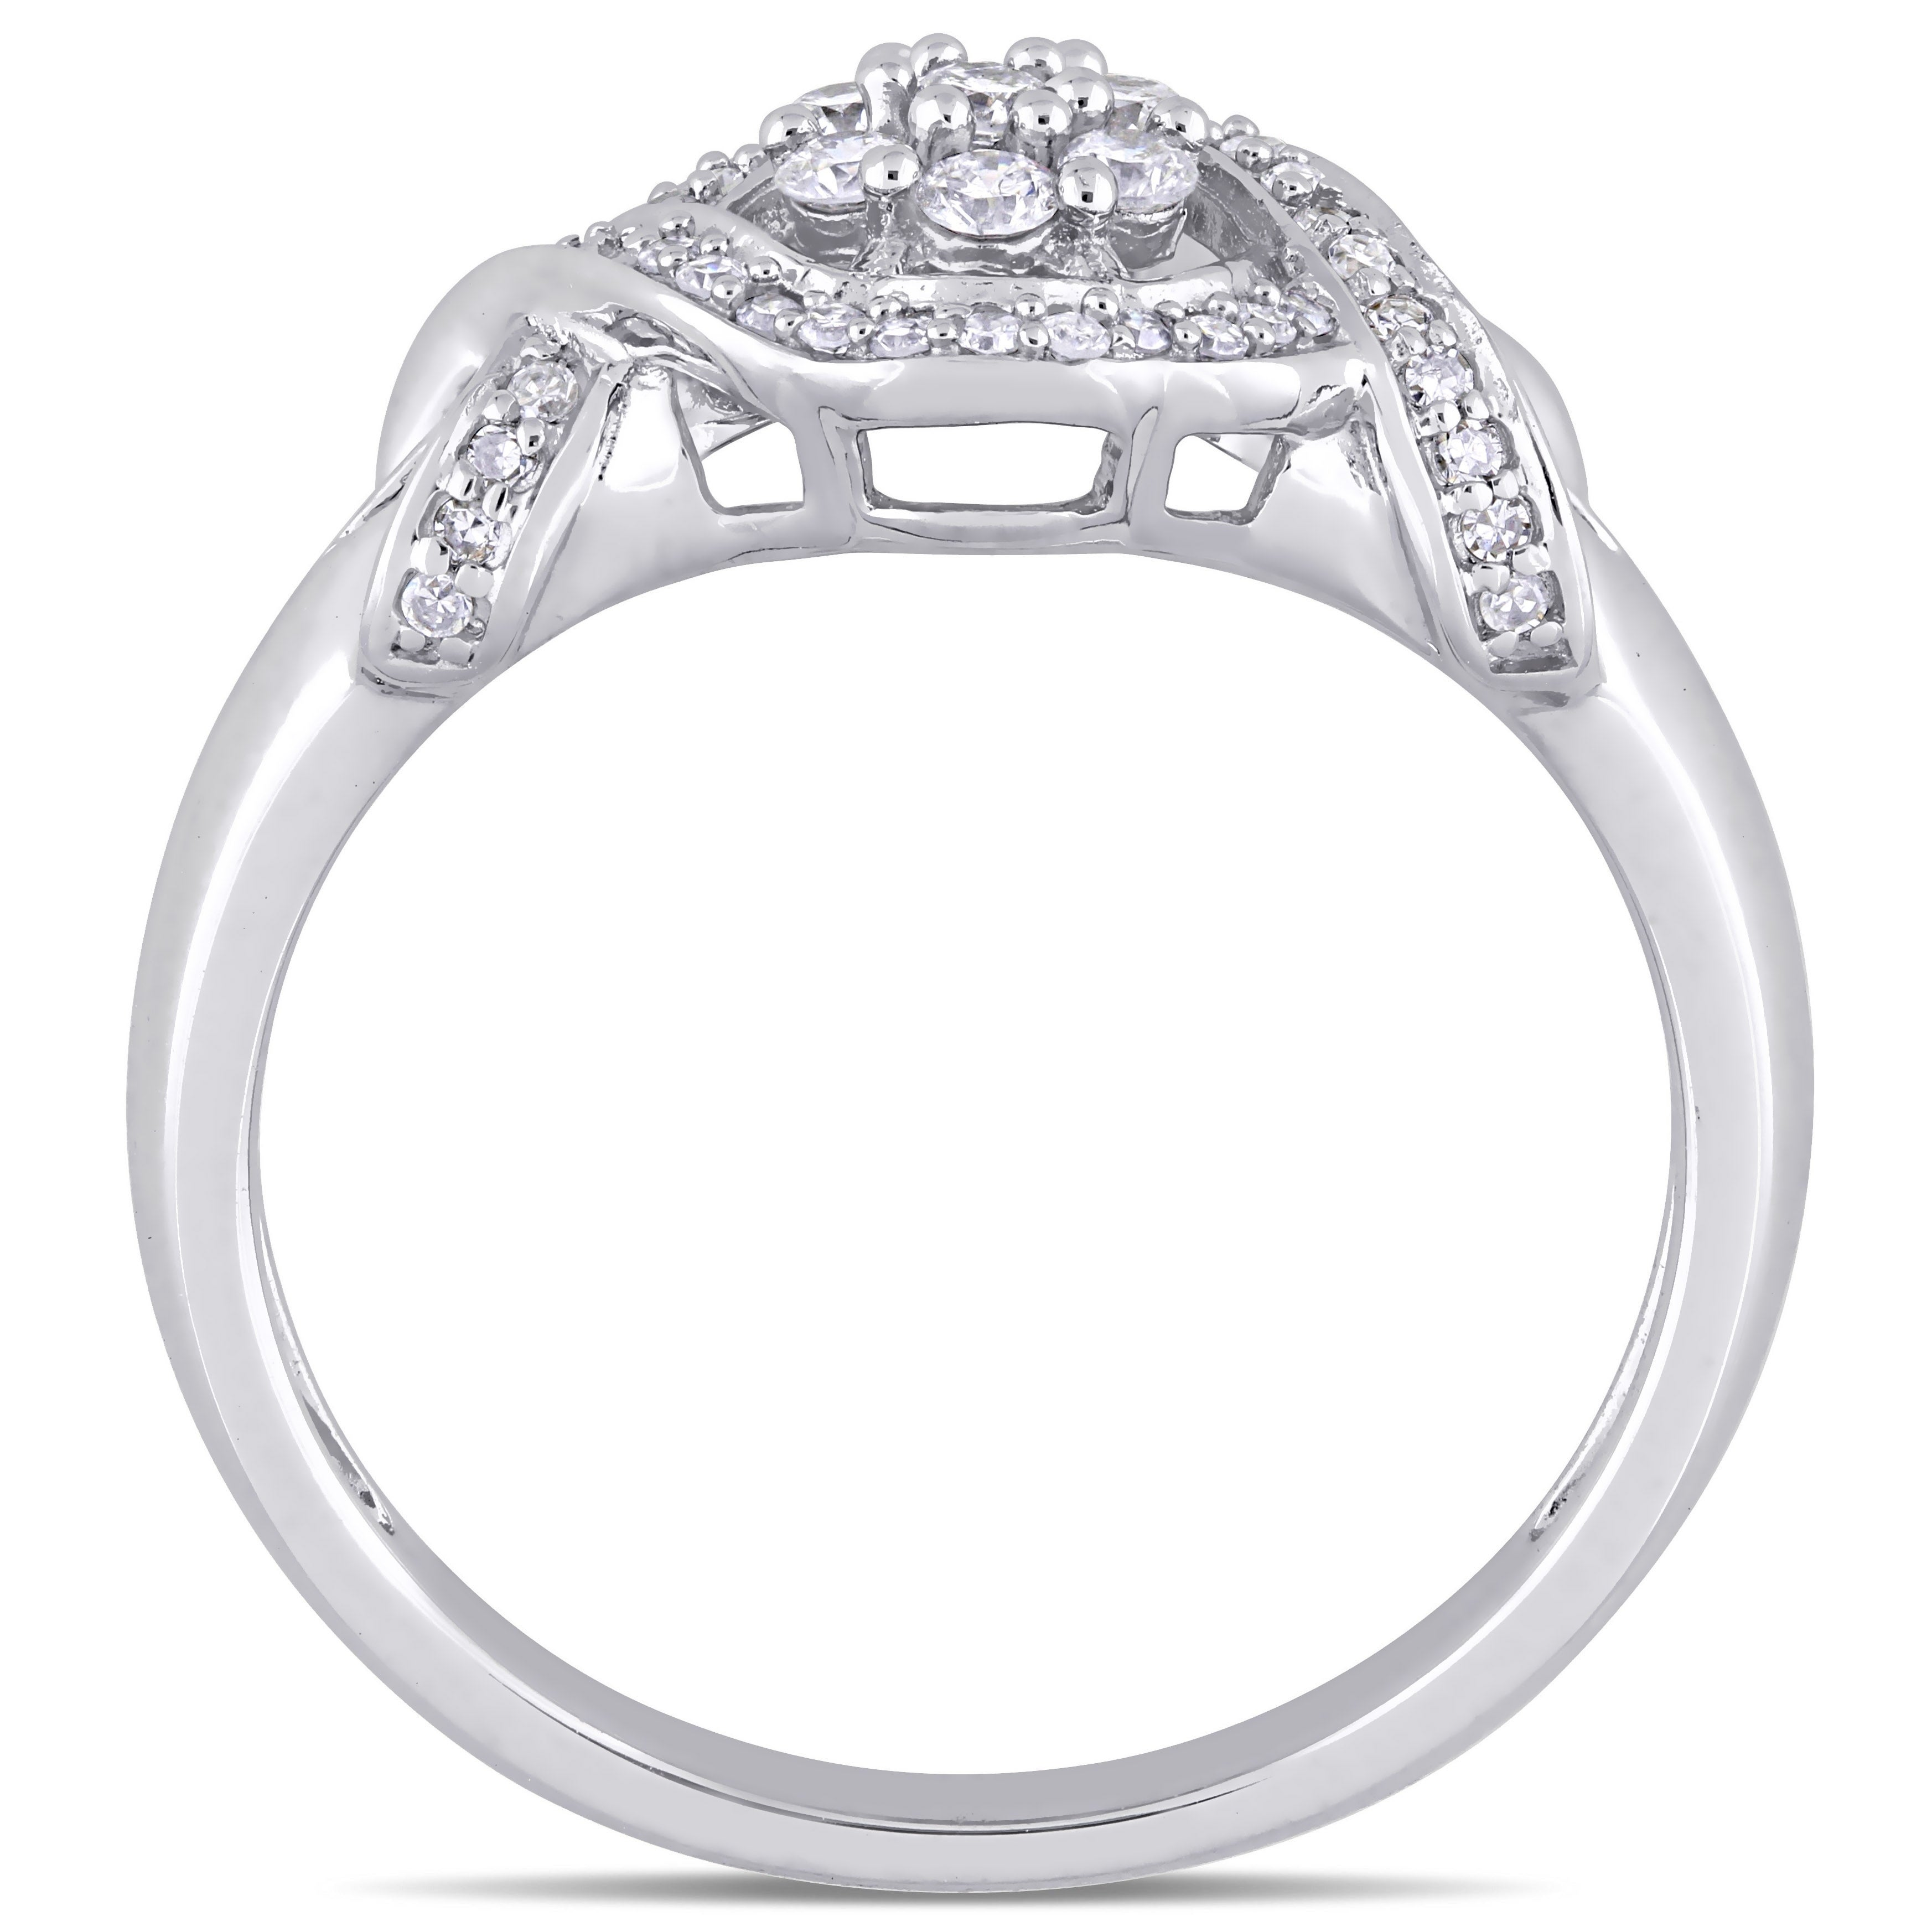 Diamond Wedding Band in 10K White Gold 1//20 cttw, G-H,I2-I3 Size-9